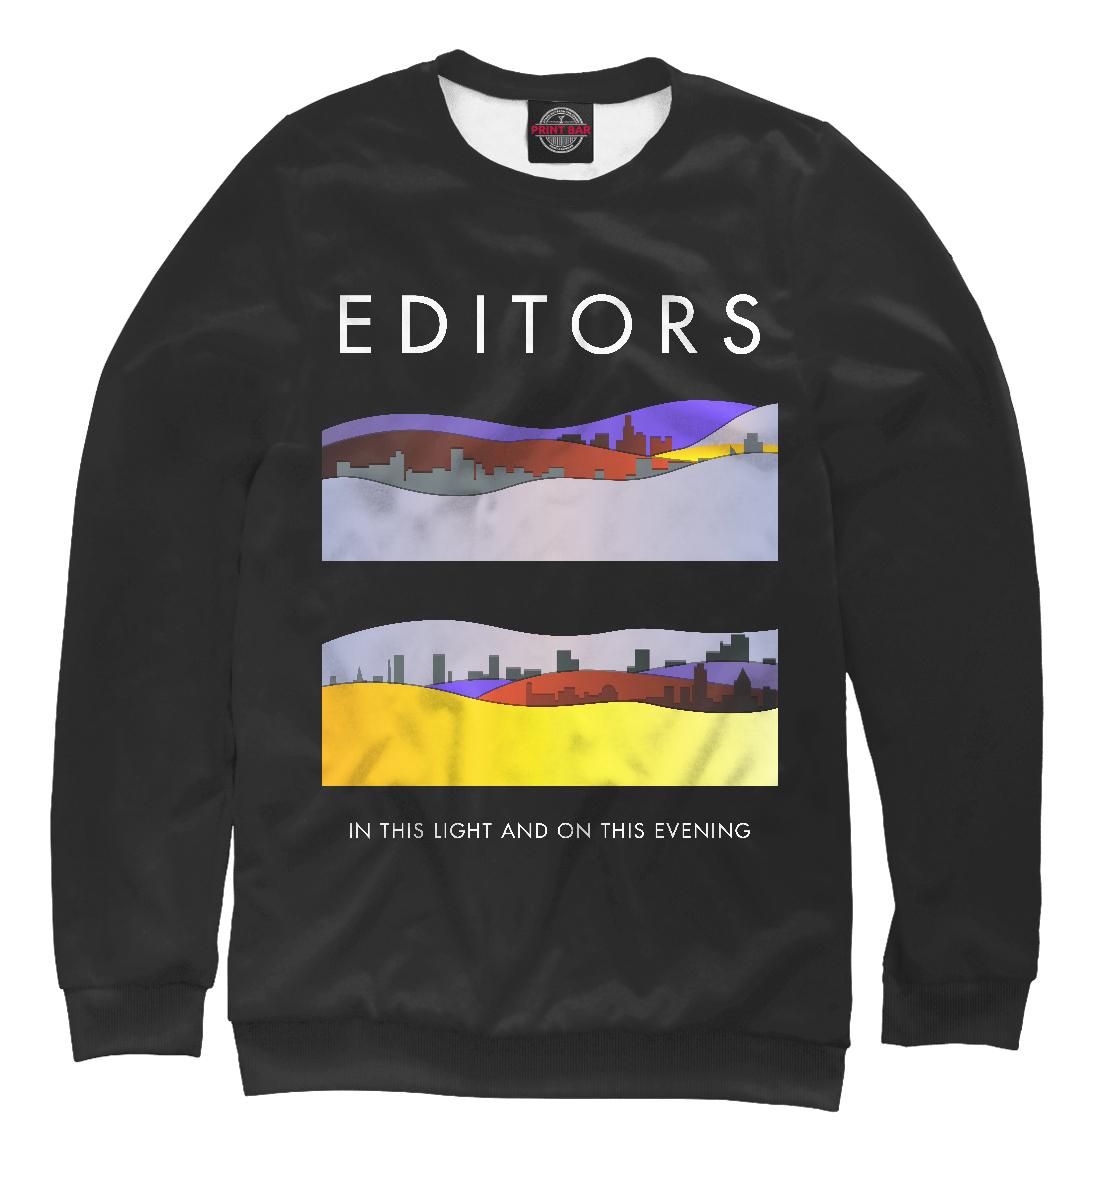 Купить Editors, Printbar, Свитшоты, MZK-457598-swi-2